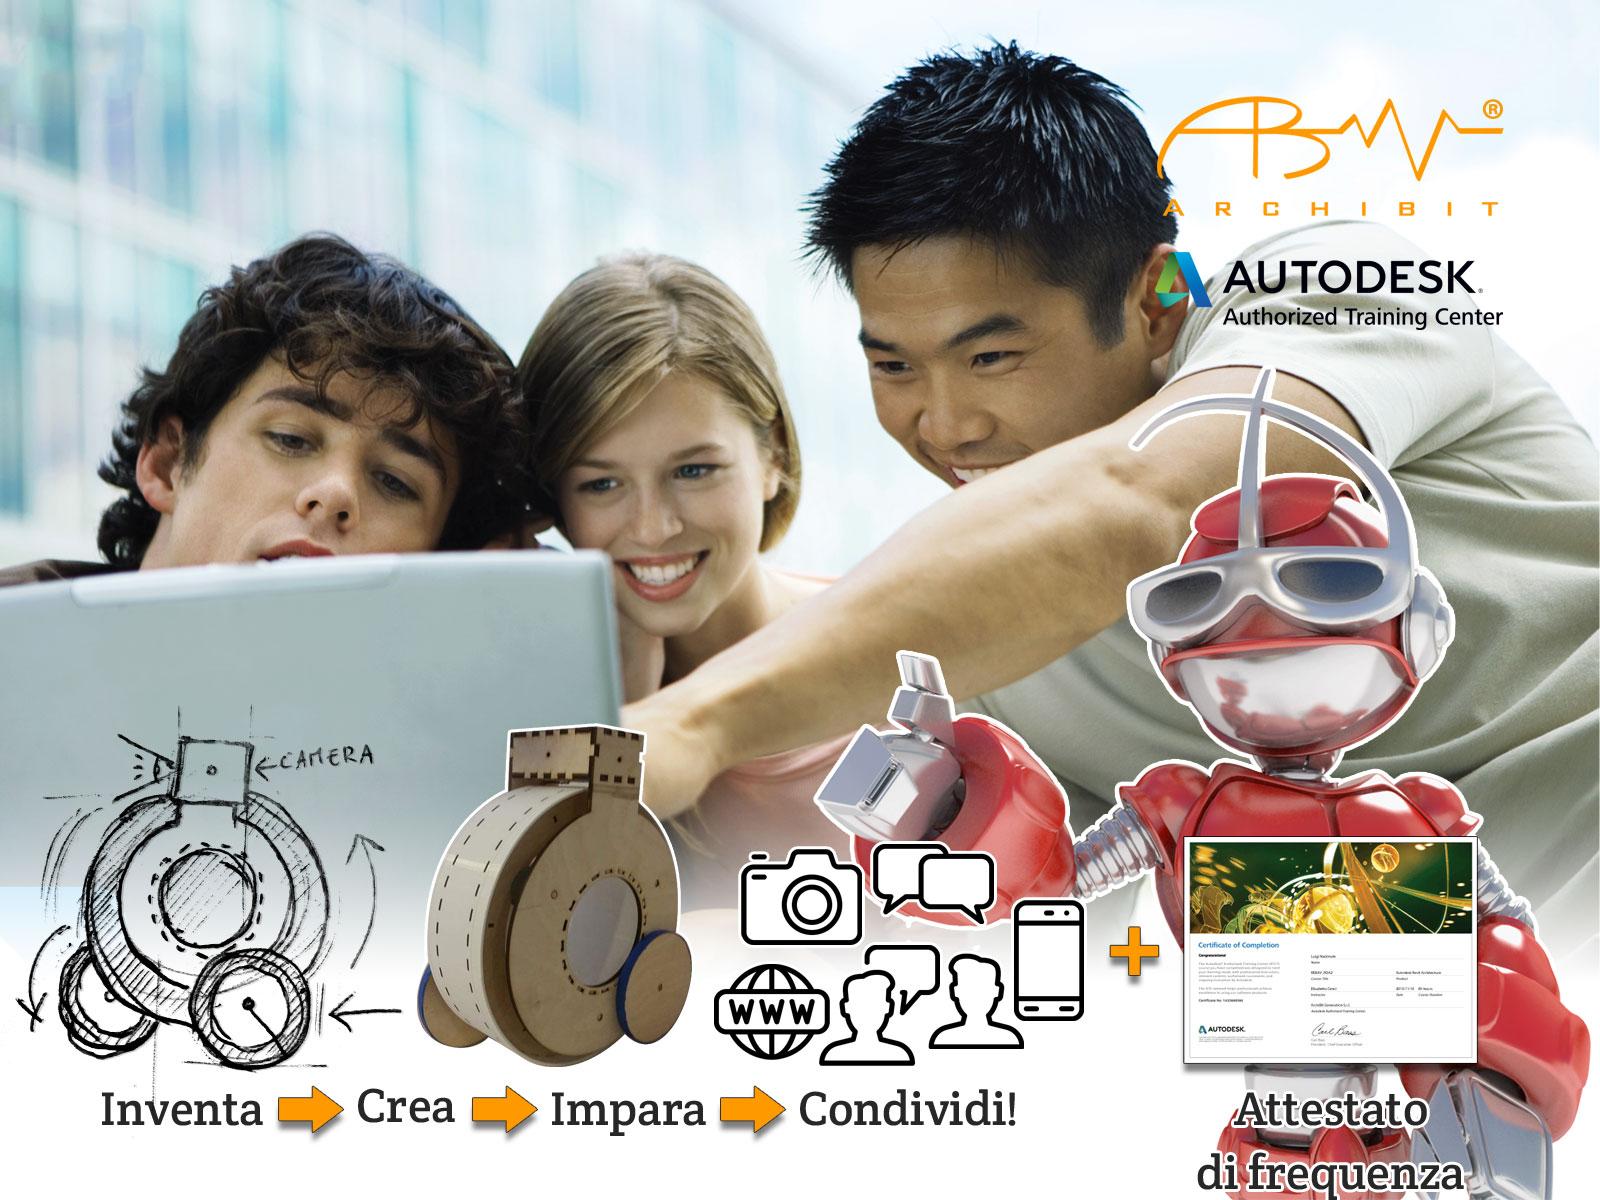 corso-summer-camp-tecnologico-summercamp-hitech-corsi-ragazzi-archibit-centro-autodesk-roma